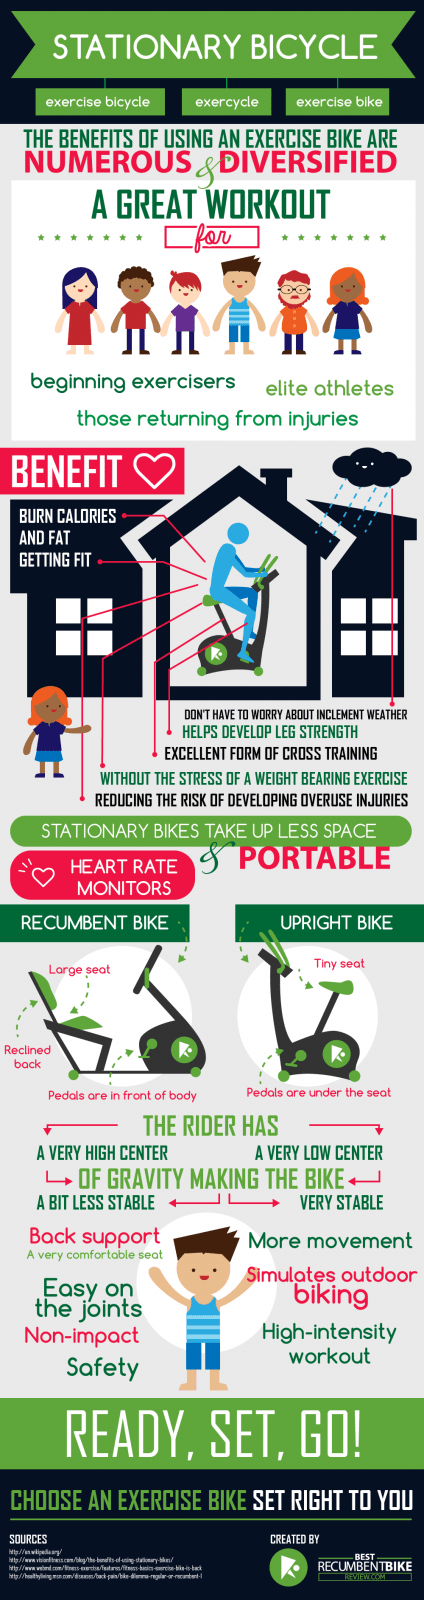 Infographic Recumbent Exercise Bike Reviews